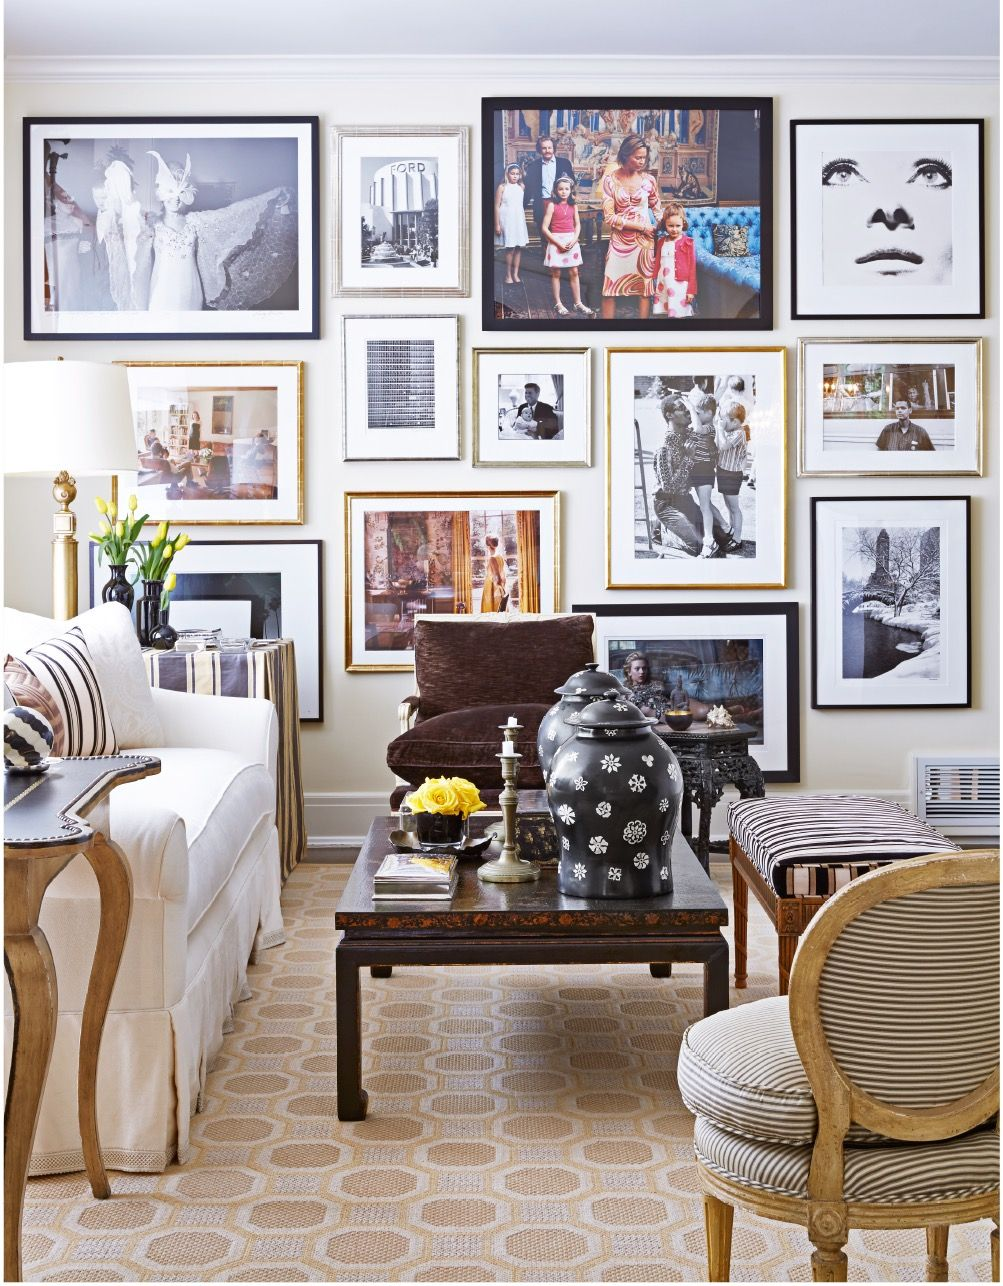 Pin de Catherine Mylona en apartment   Pinterest   Decoracion con ...